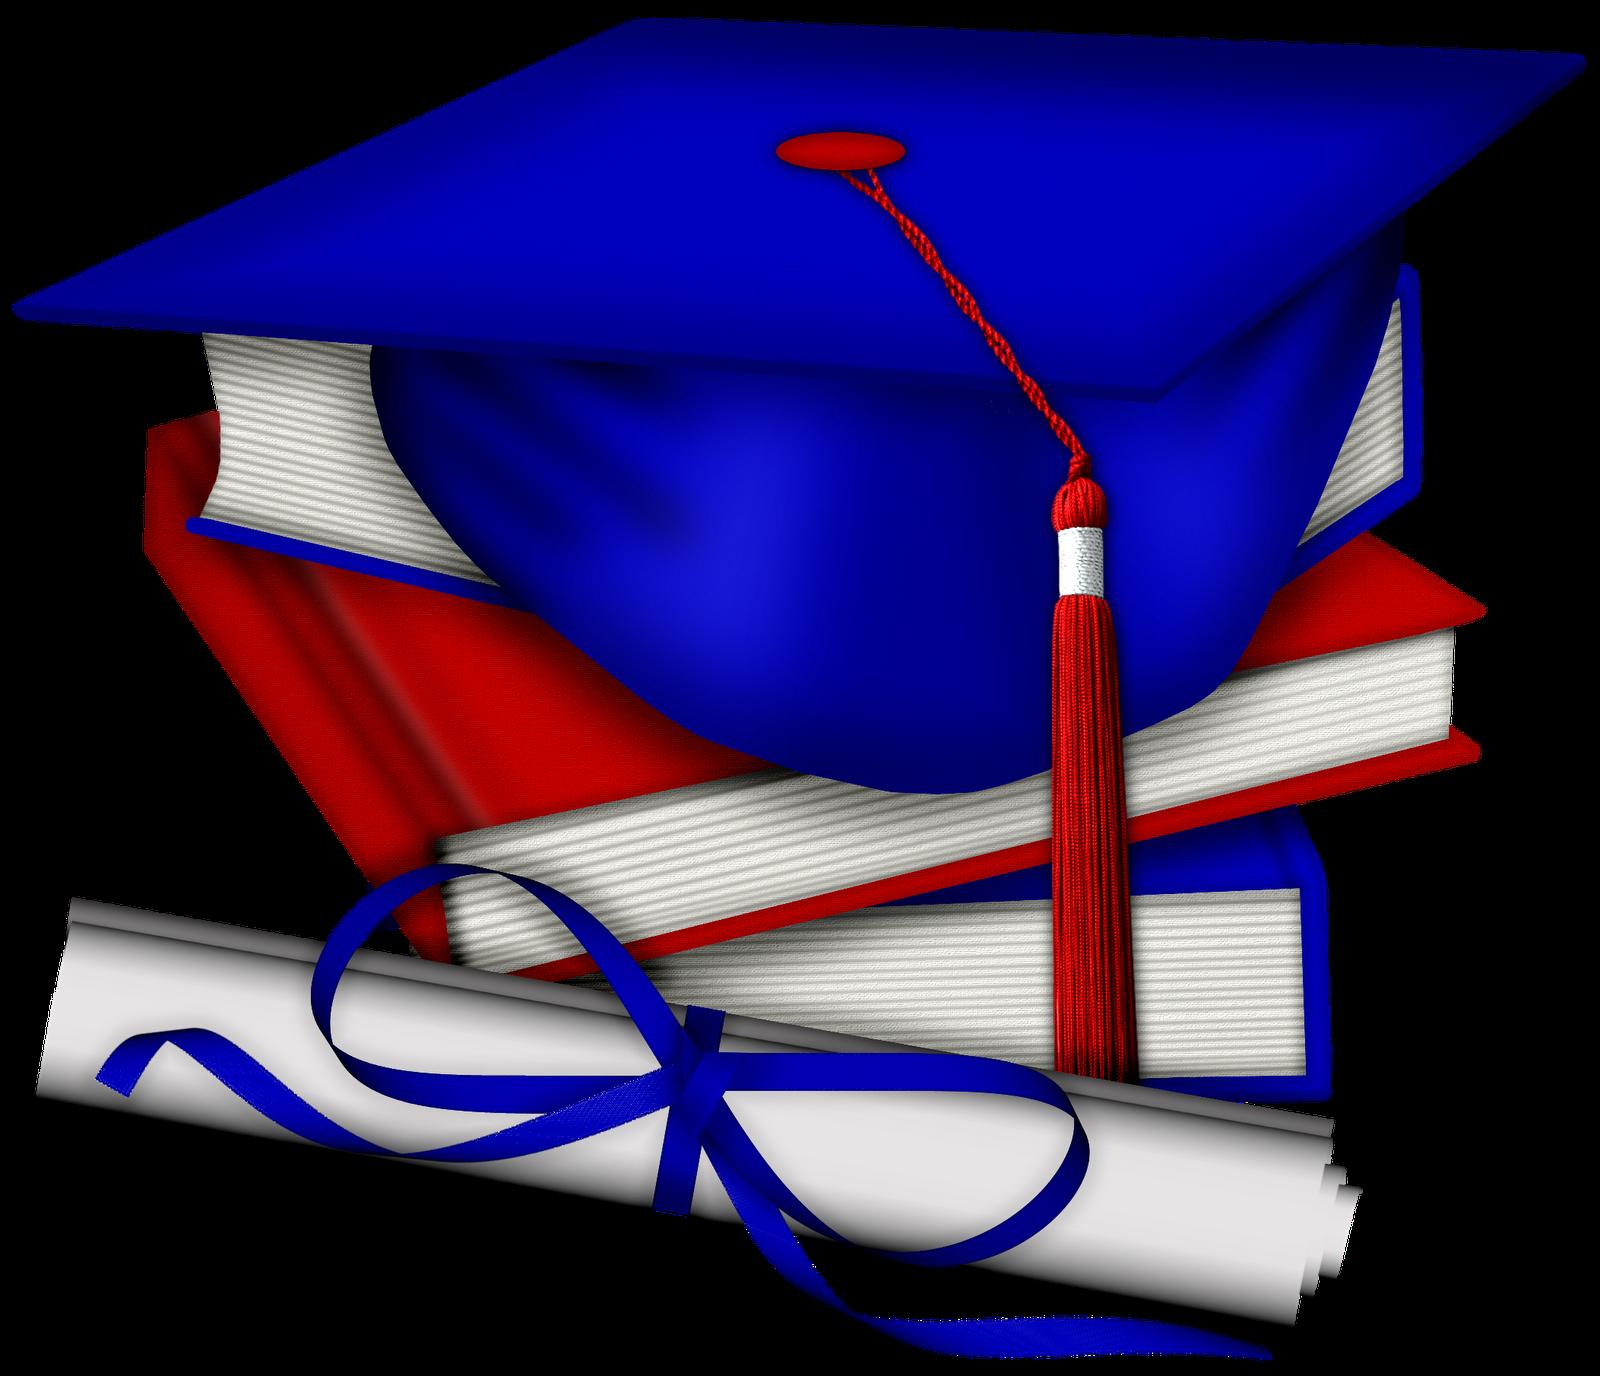 Kindergarten clipart diploma. Preschool graduation border clip